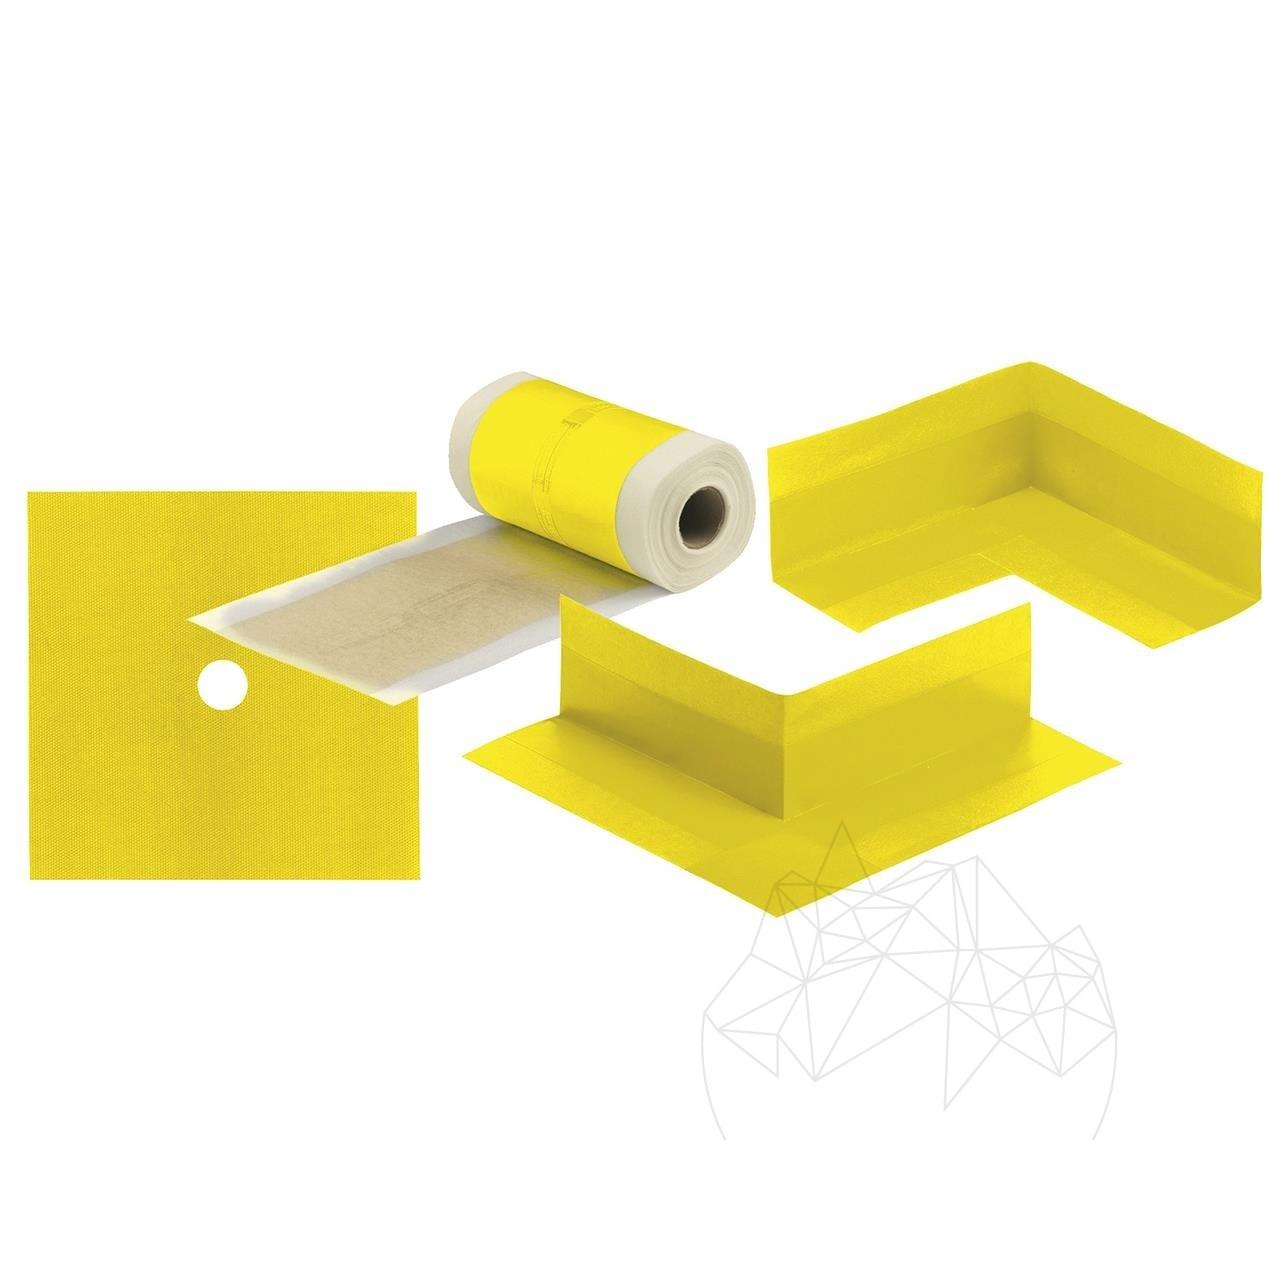 Weber Tec 822 - Profesional flexible waterproof under tiles sealant title=Weber Tec 822 - Profesional flexible waterproof under tiles sealant